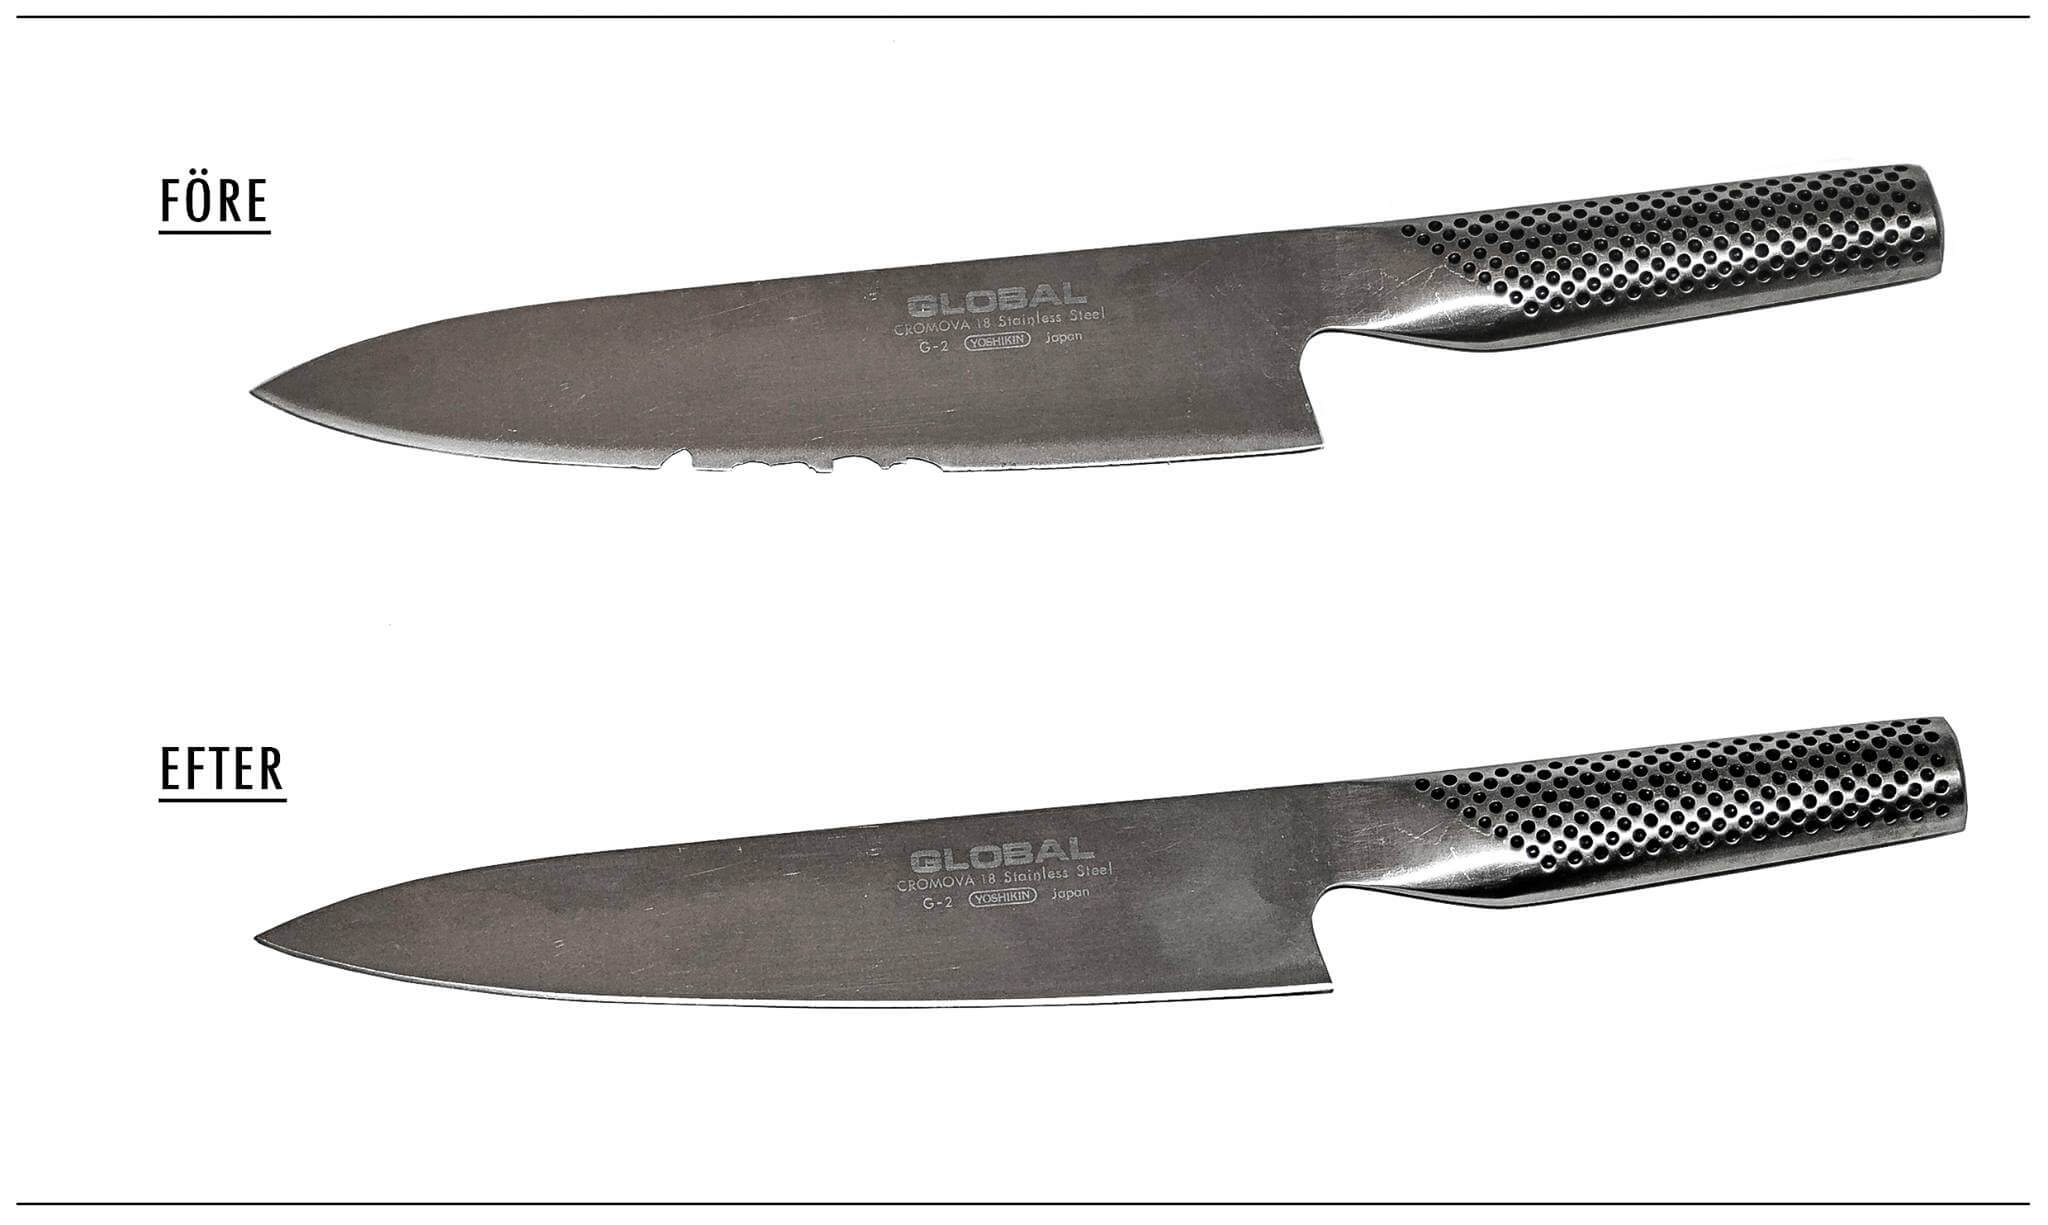 Fantastisk Slipa Globalknivar som kockarna! Knivbrev - Sveriges största sliperi PK19